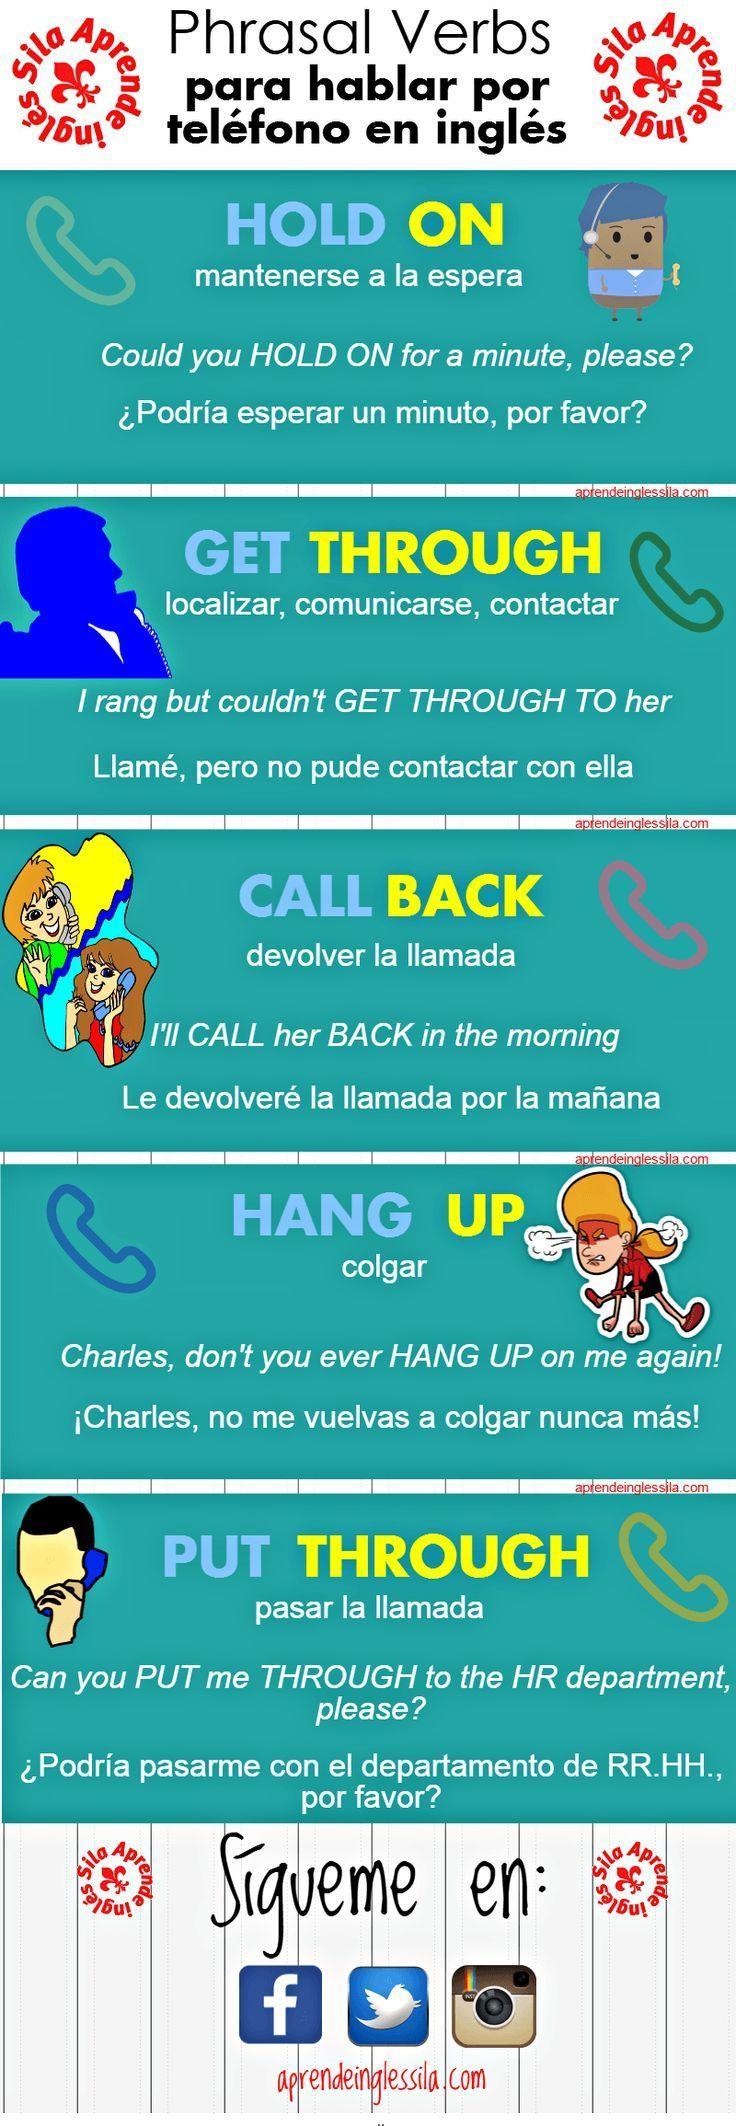 hablar por teléfono en inglés #infografias #infographic